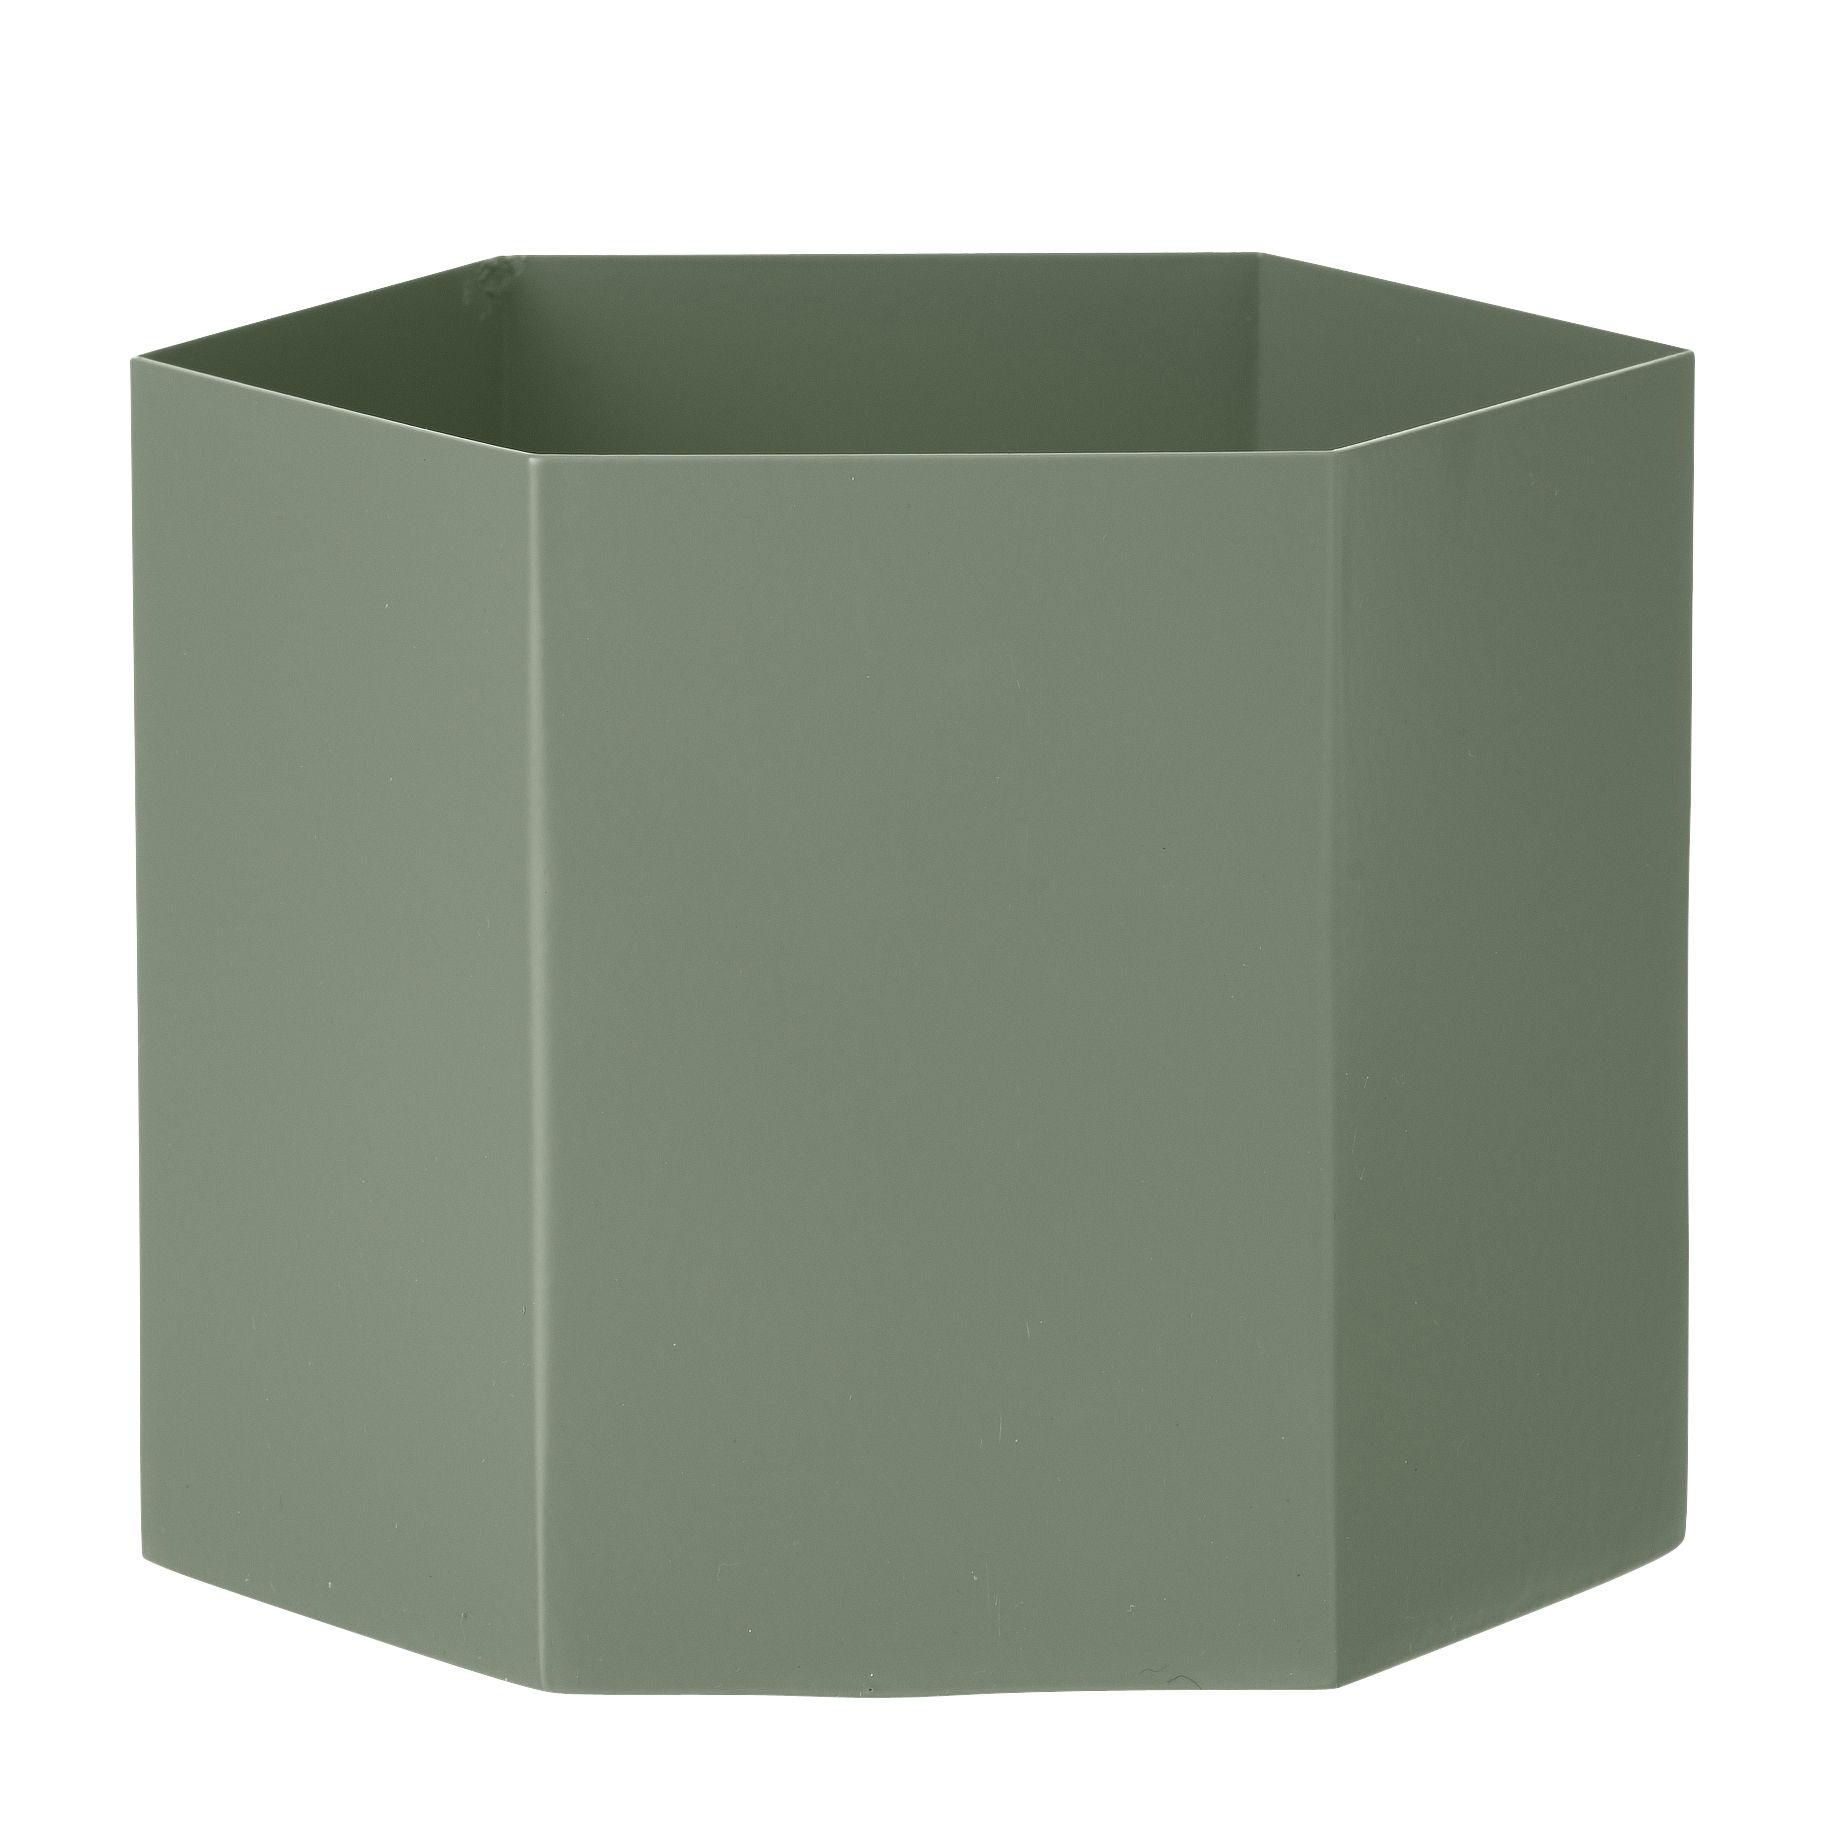 hexagon xl large 18 cm ferm living blumentopf. Black Bedroom Furniture Sets. Home Design Ideas